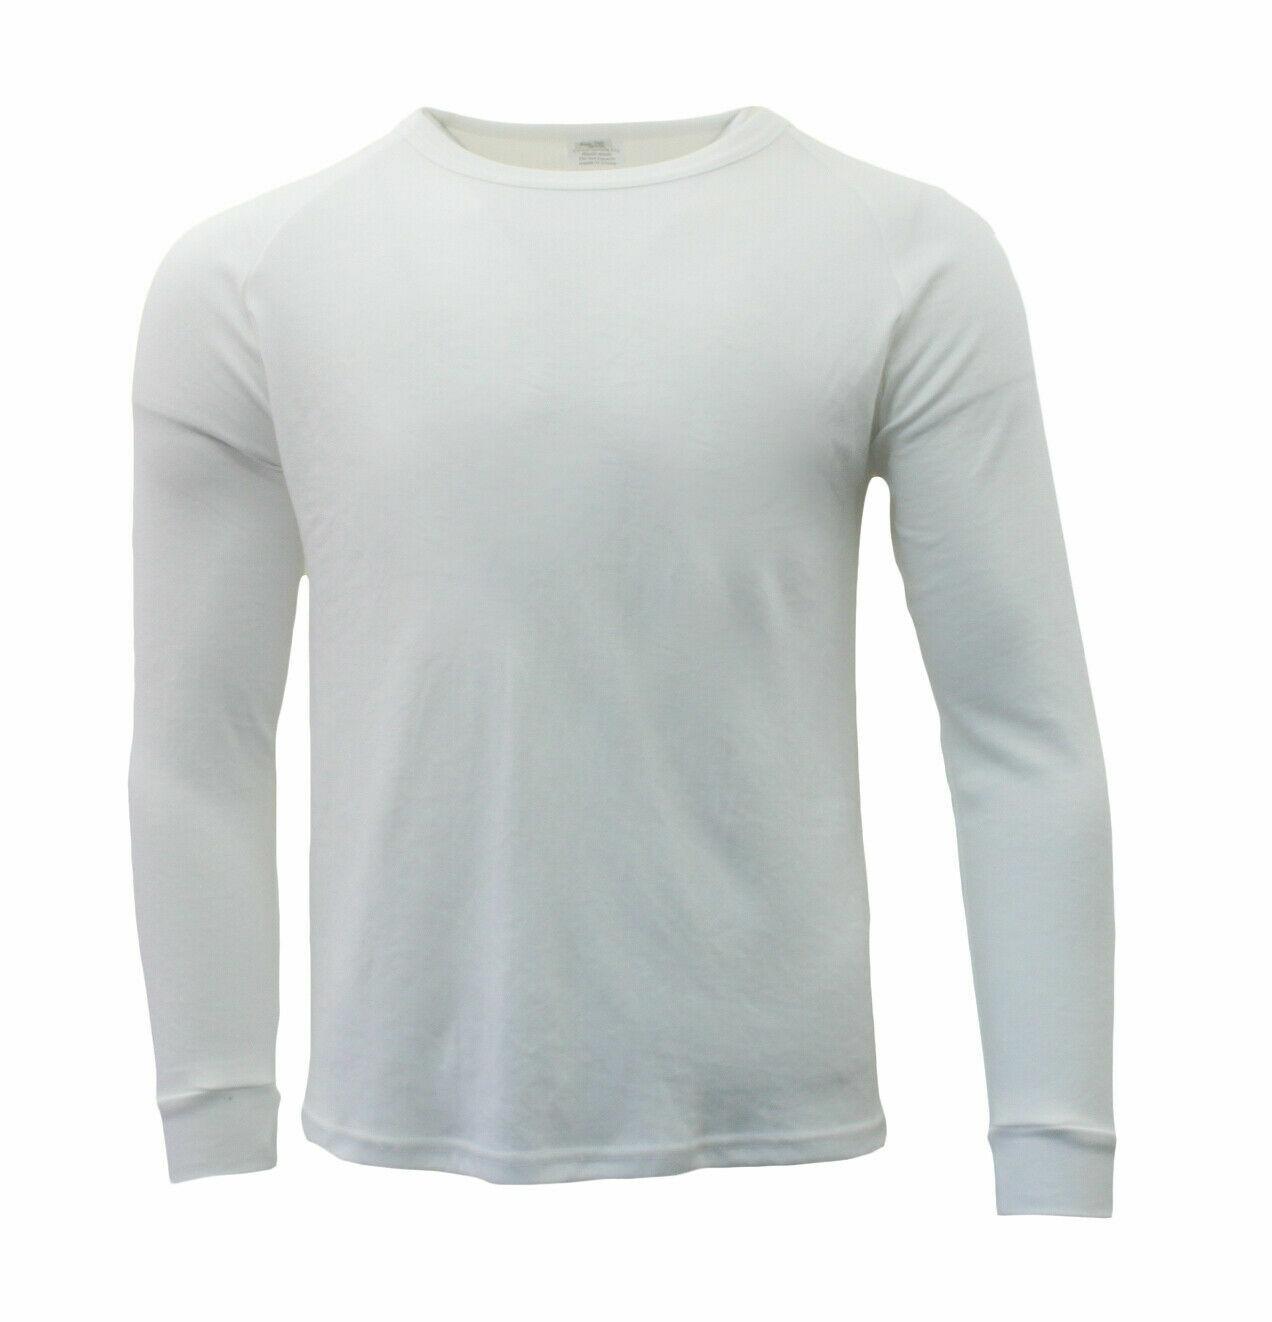 Men/'s Merino Wool Blend Long Sleeve Thermal Top Pants Long Johns Underwear S-2XL